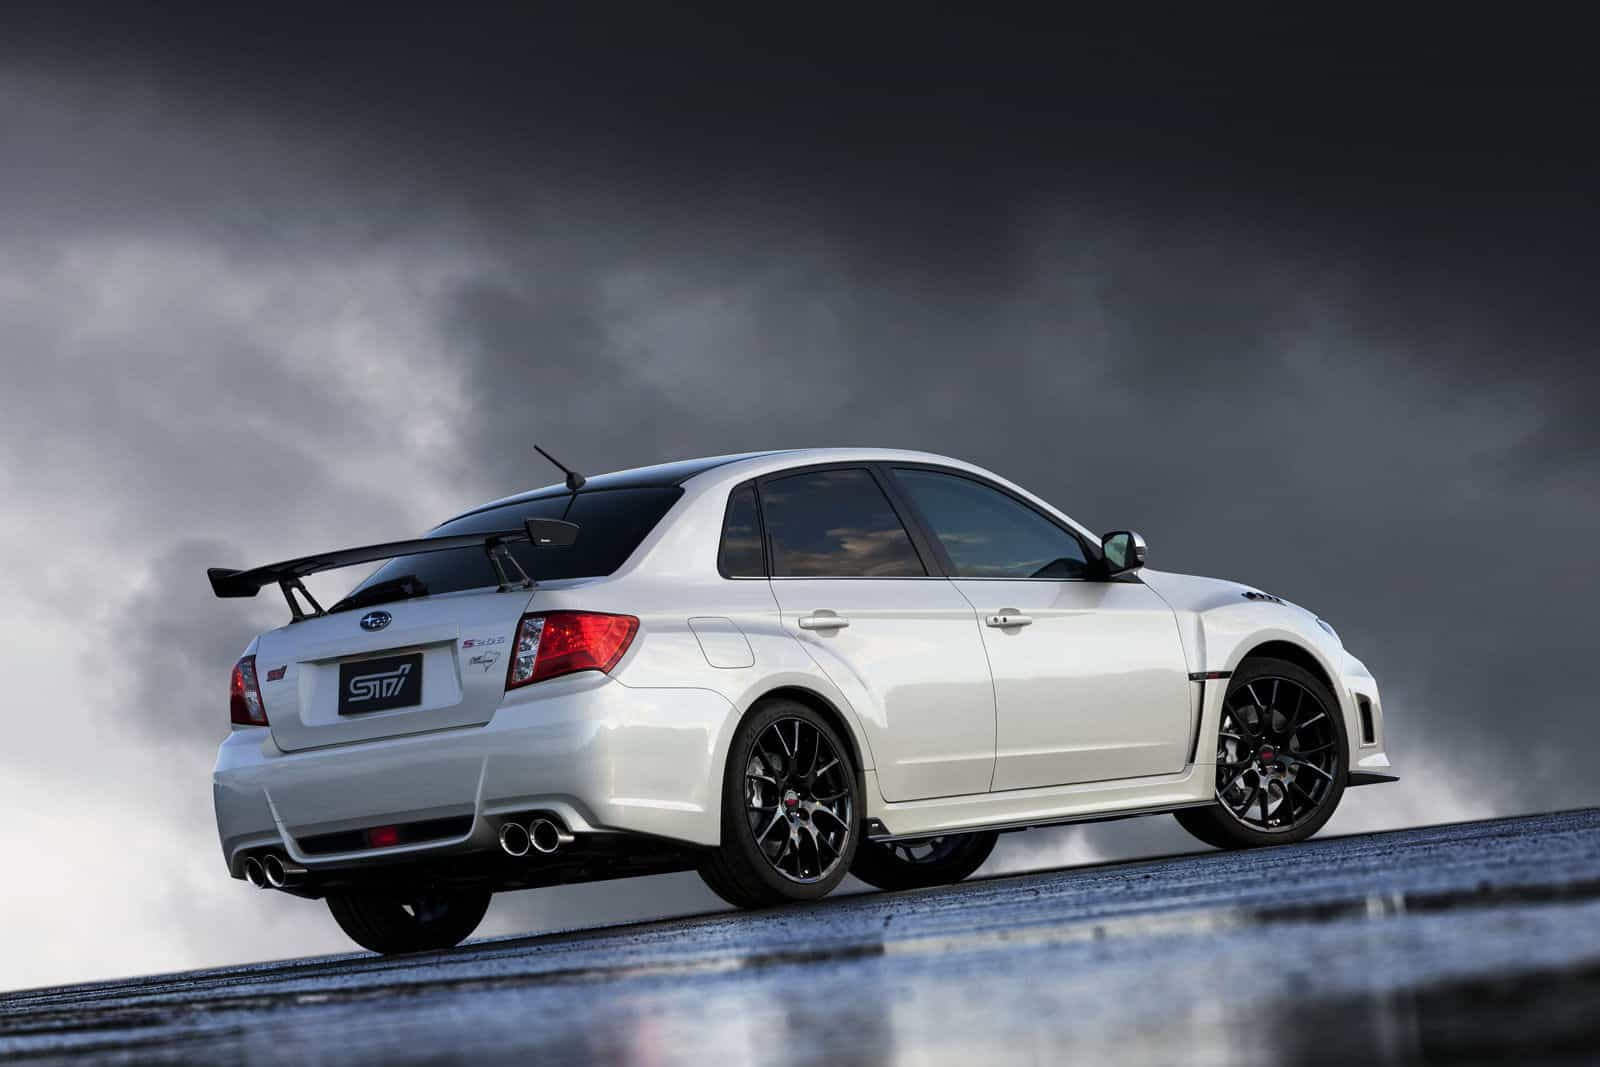 Subaru Impreza WRX STi S206 NBR Challenge Back